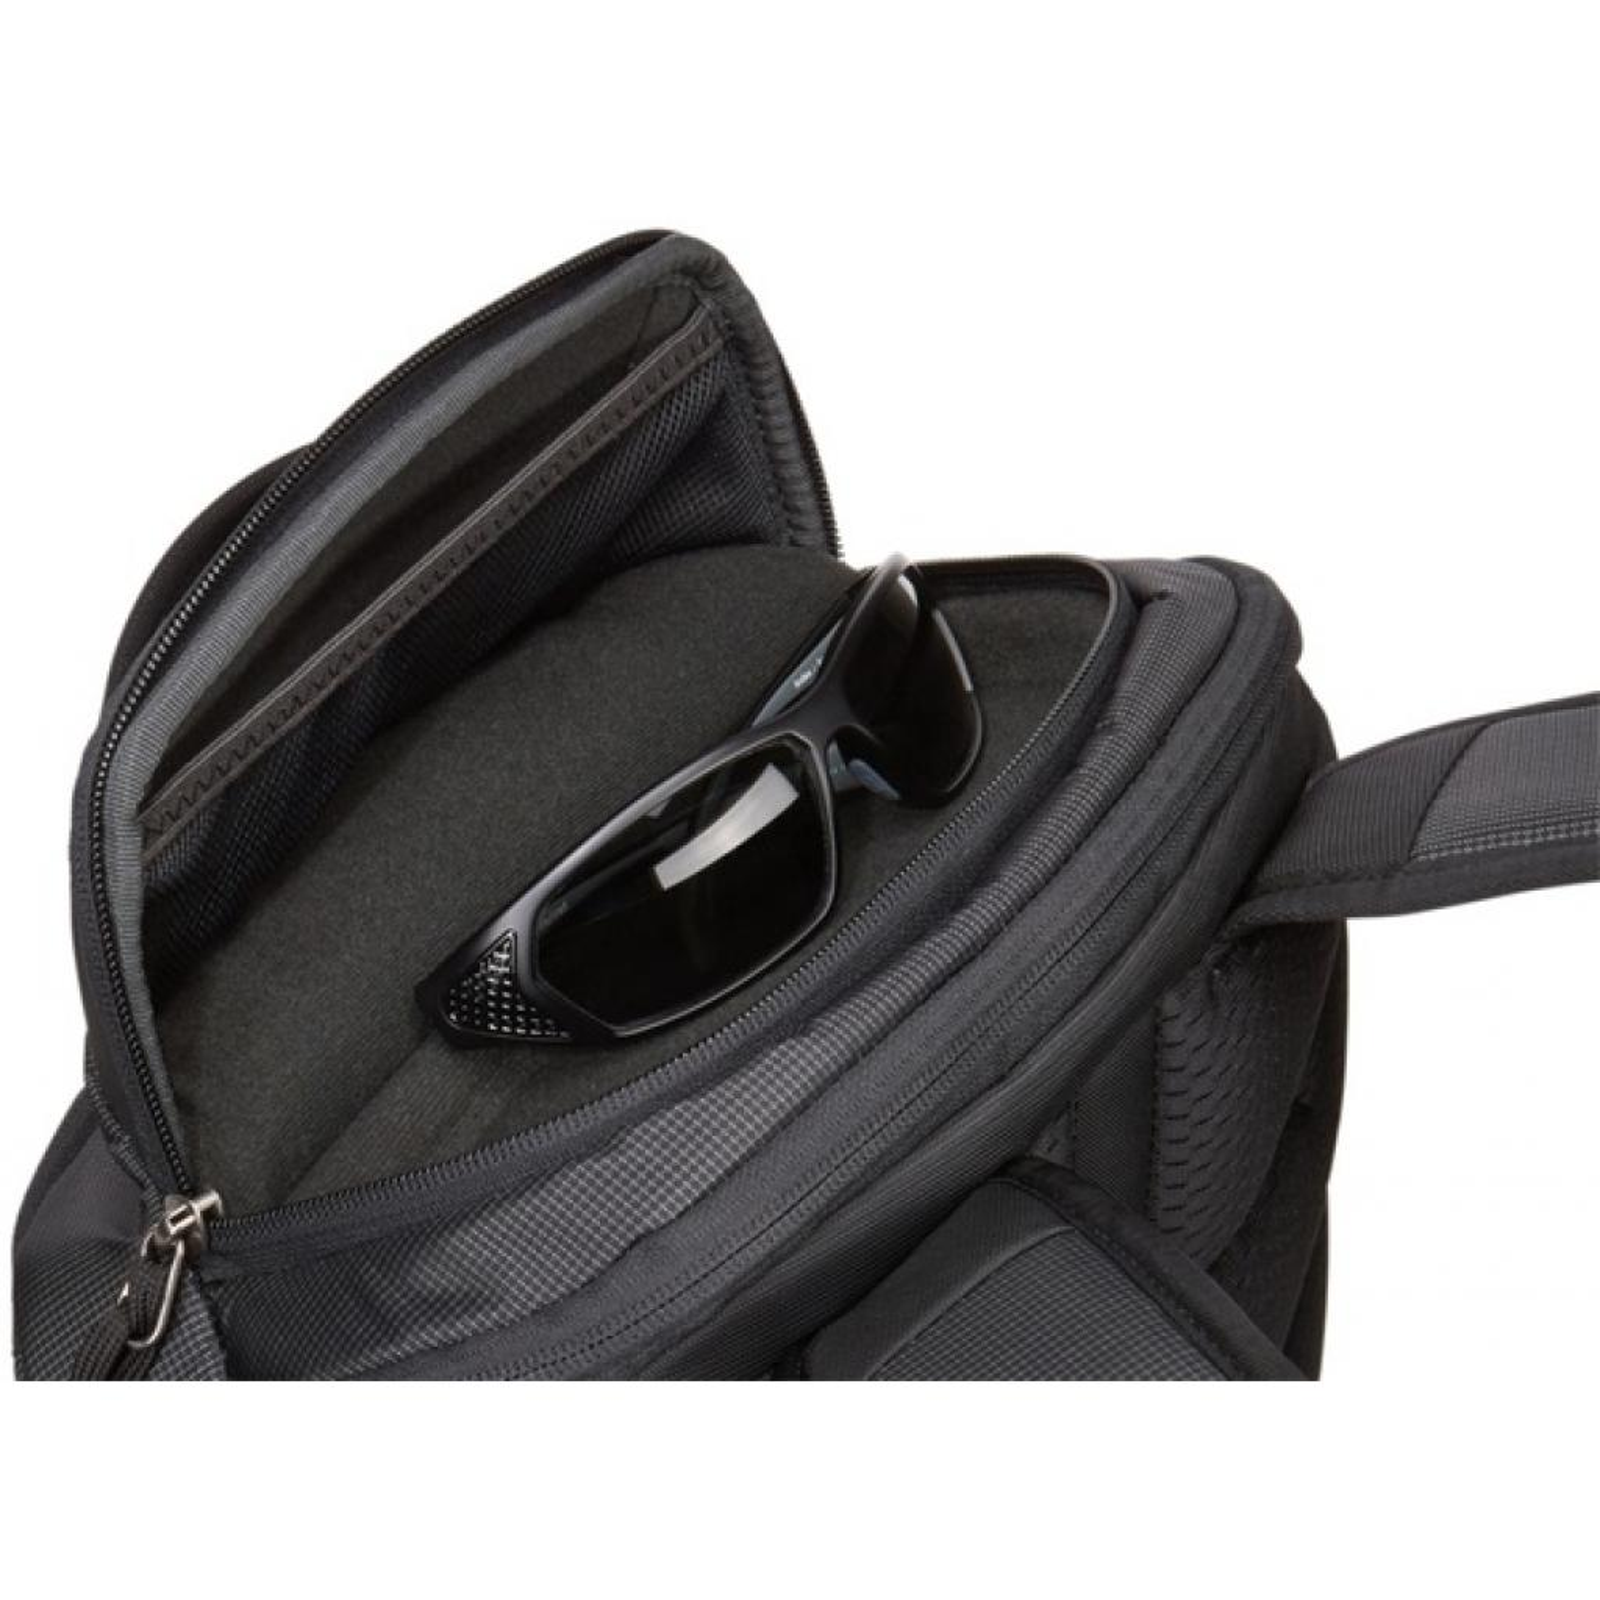 "Рюкзак для ноутбука Thule 15.6"" EnRoute 23L TEBP-316 Asphalt (3203830) изображение 5"